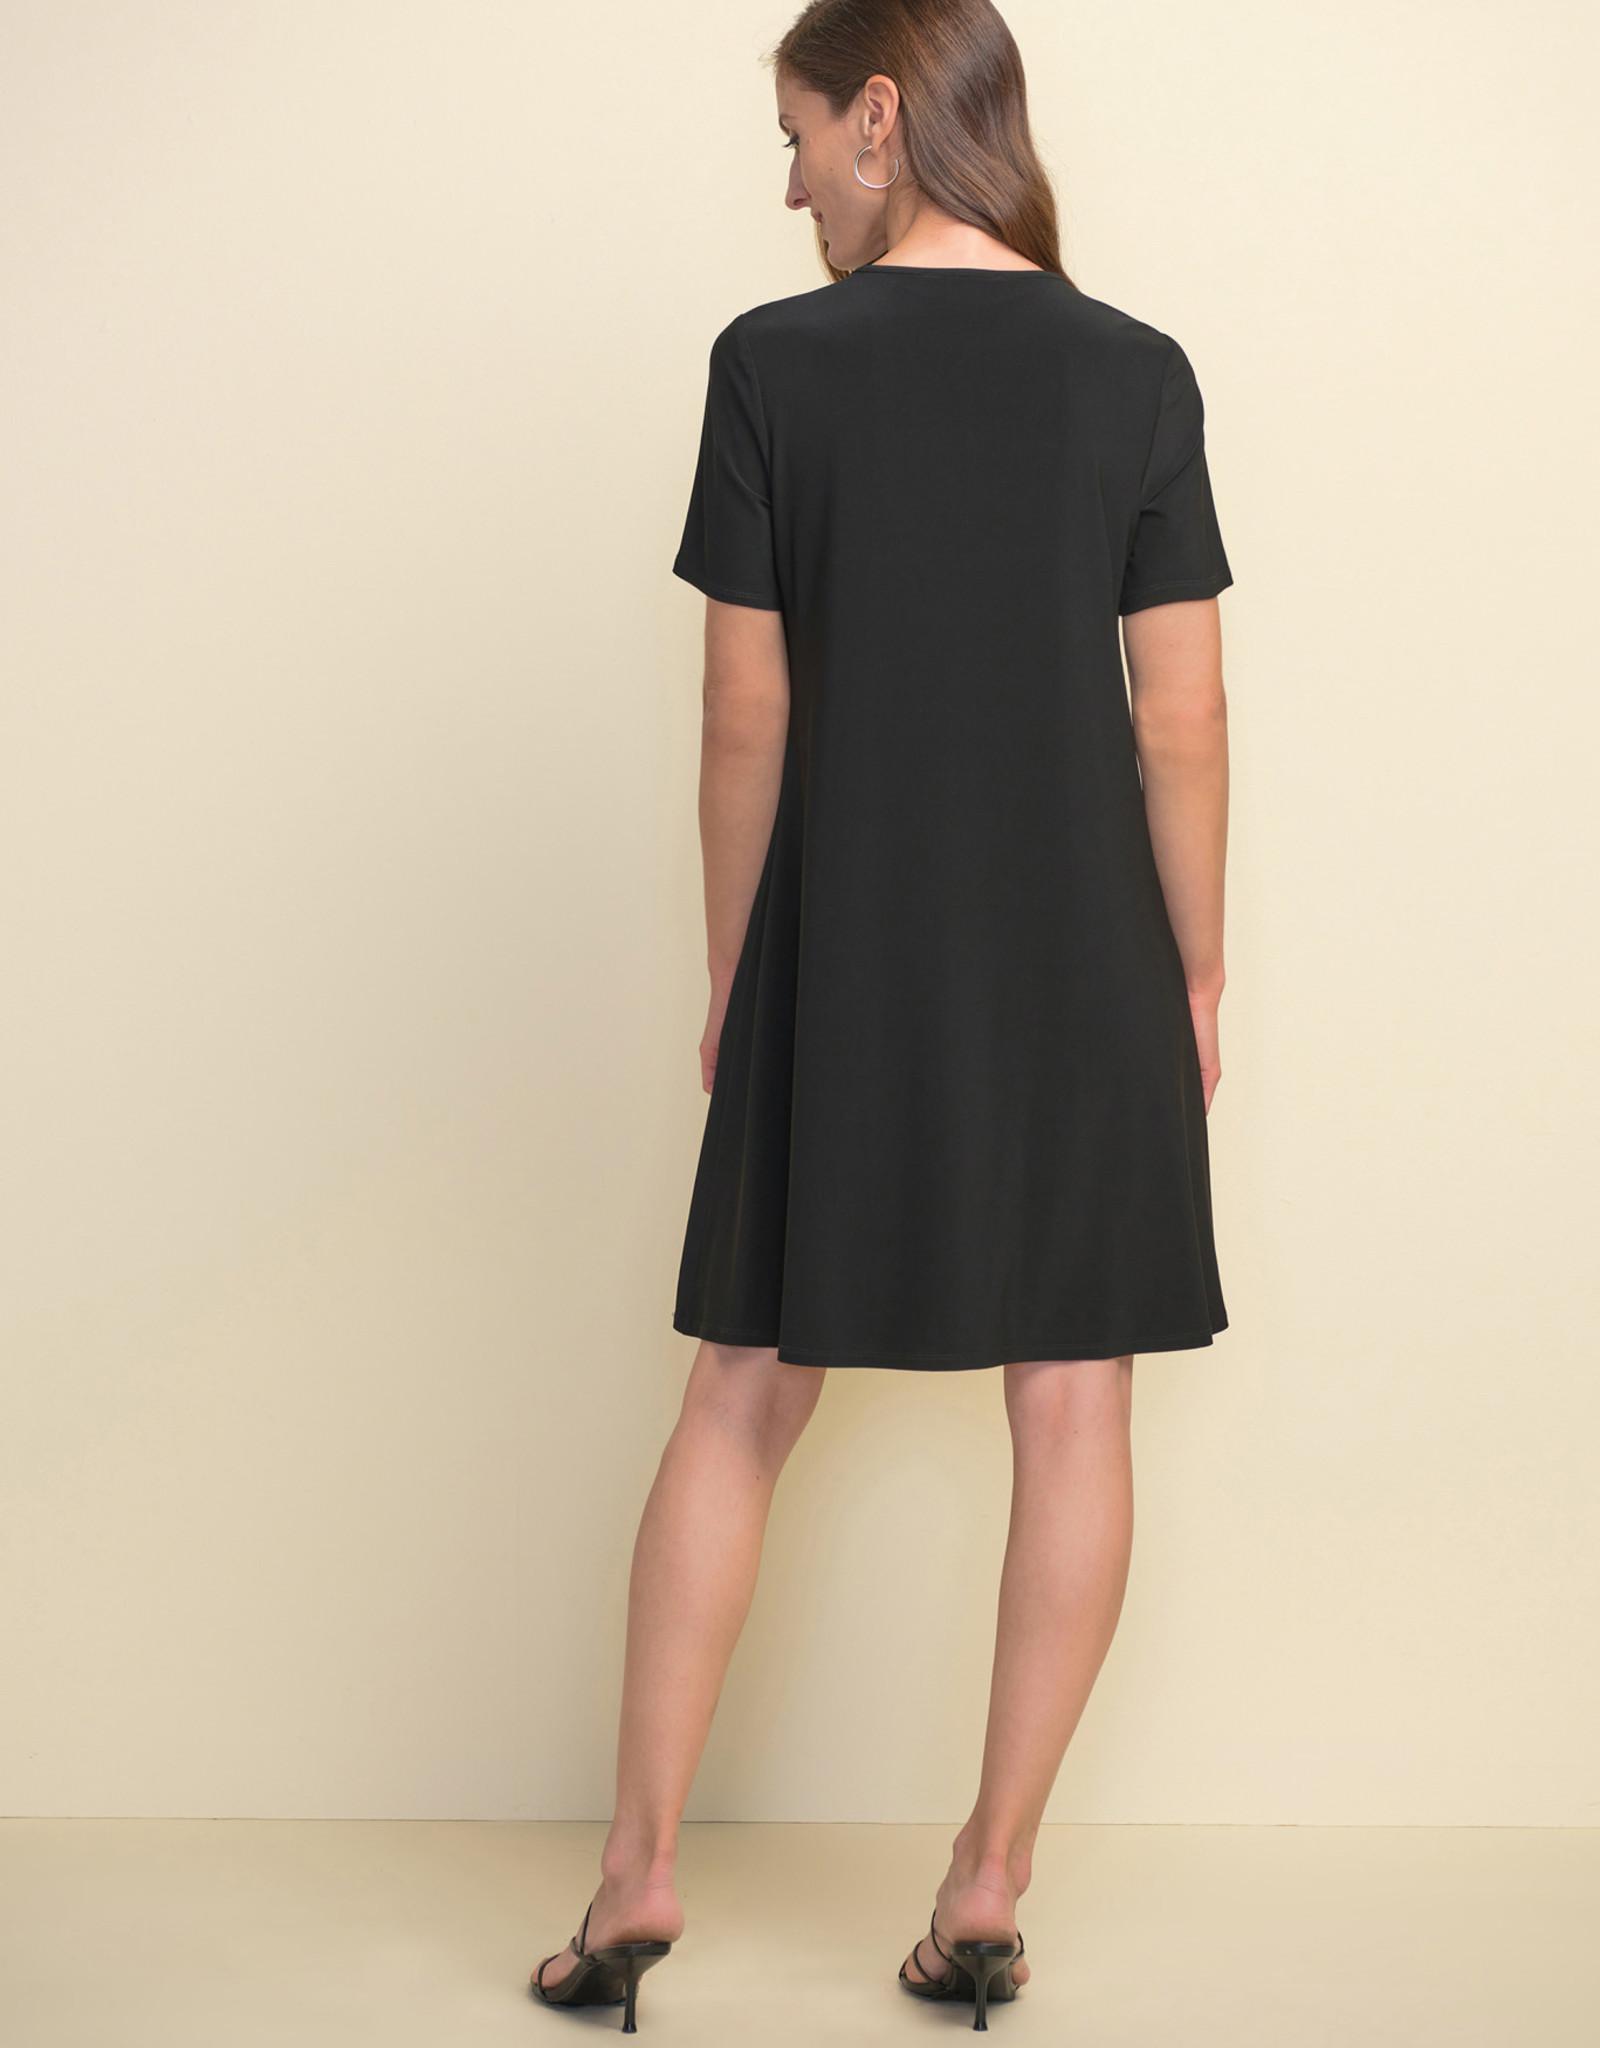 Joseph Ribkoff Joseph Ribkoff short sleeve dress 211105